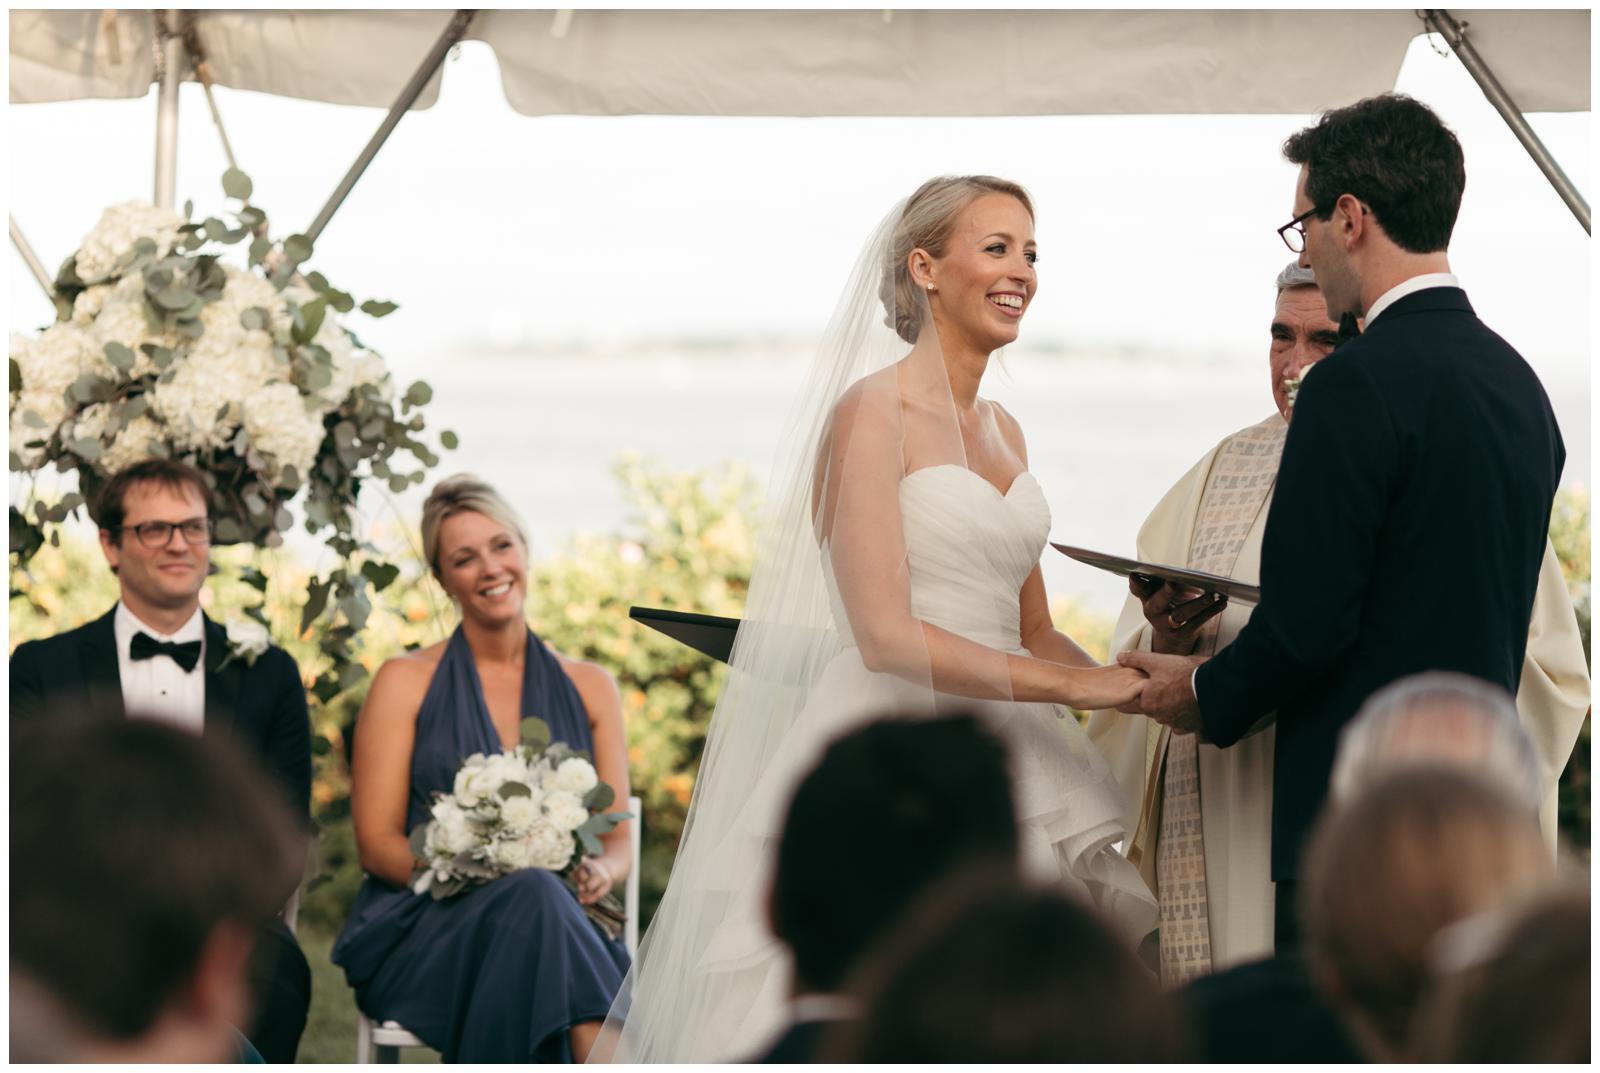 wedding ceremony in tent